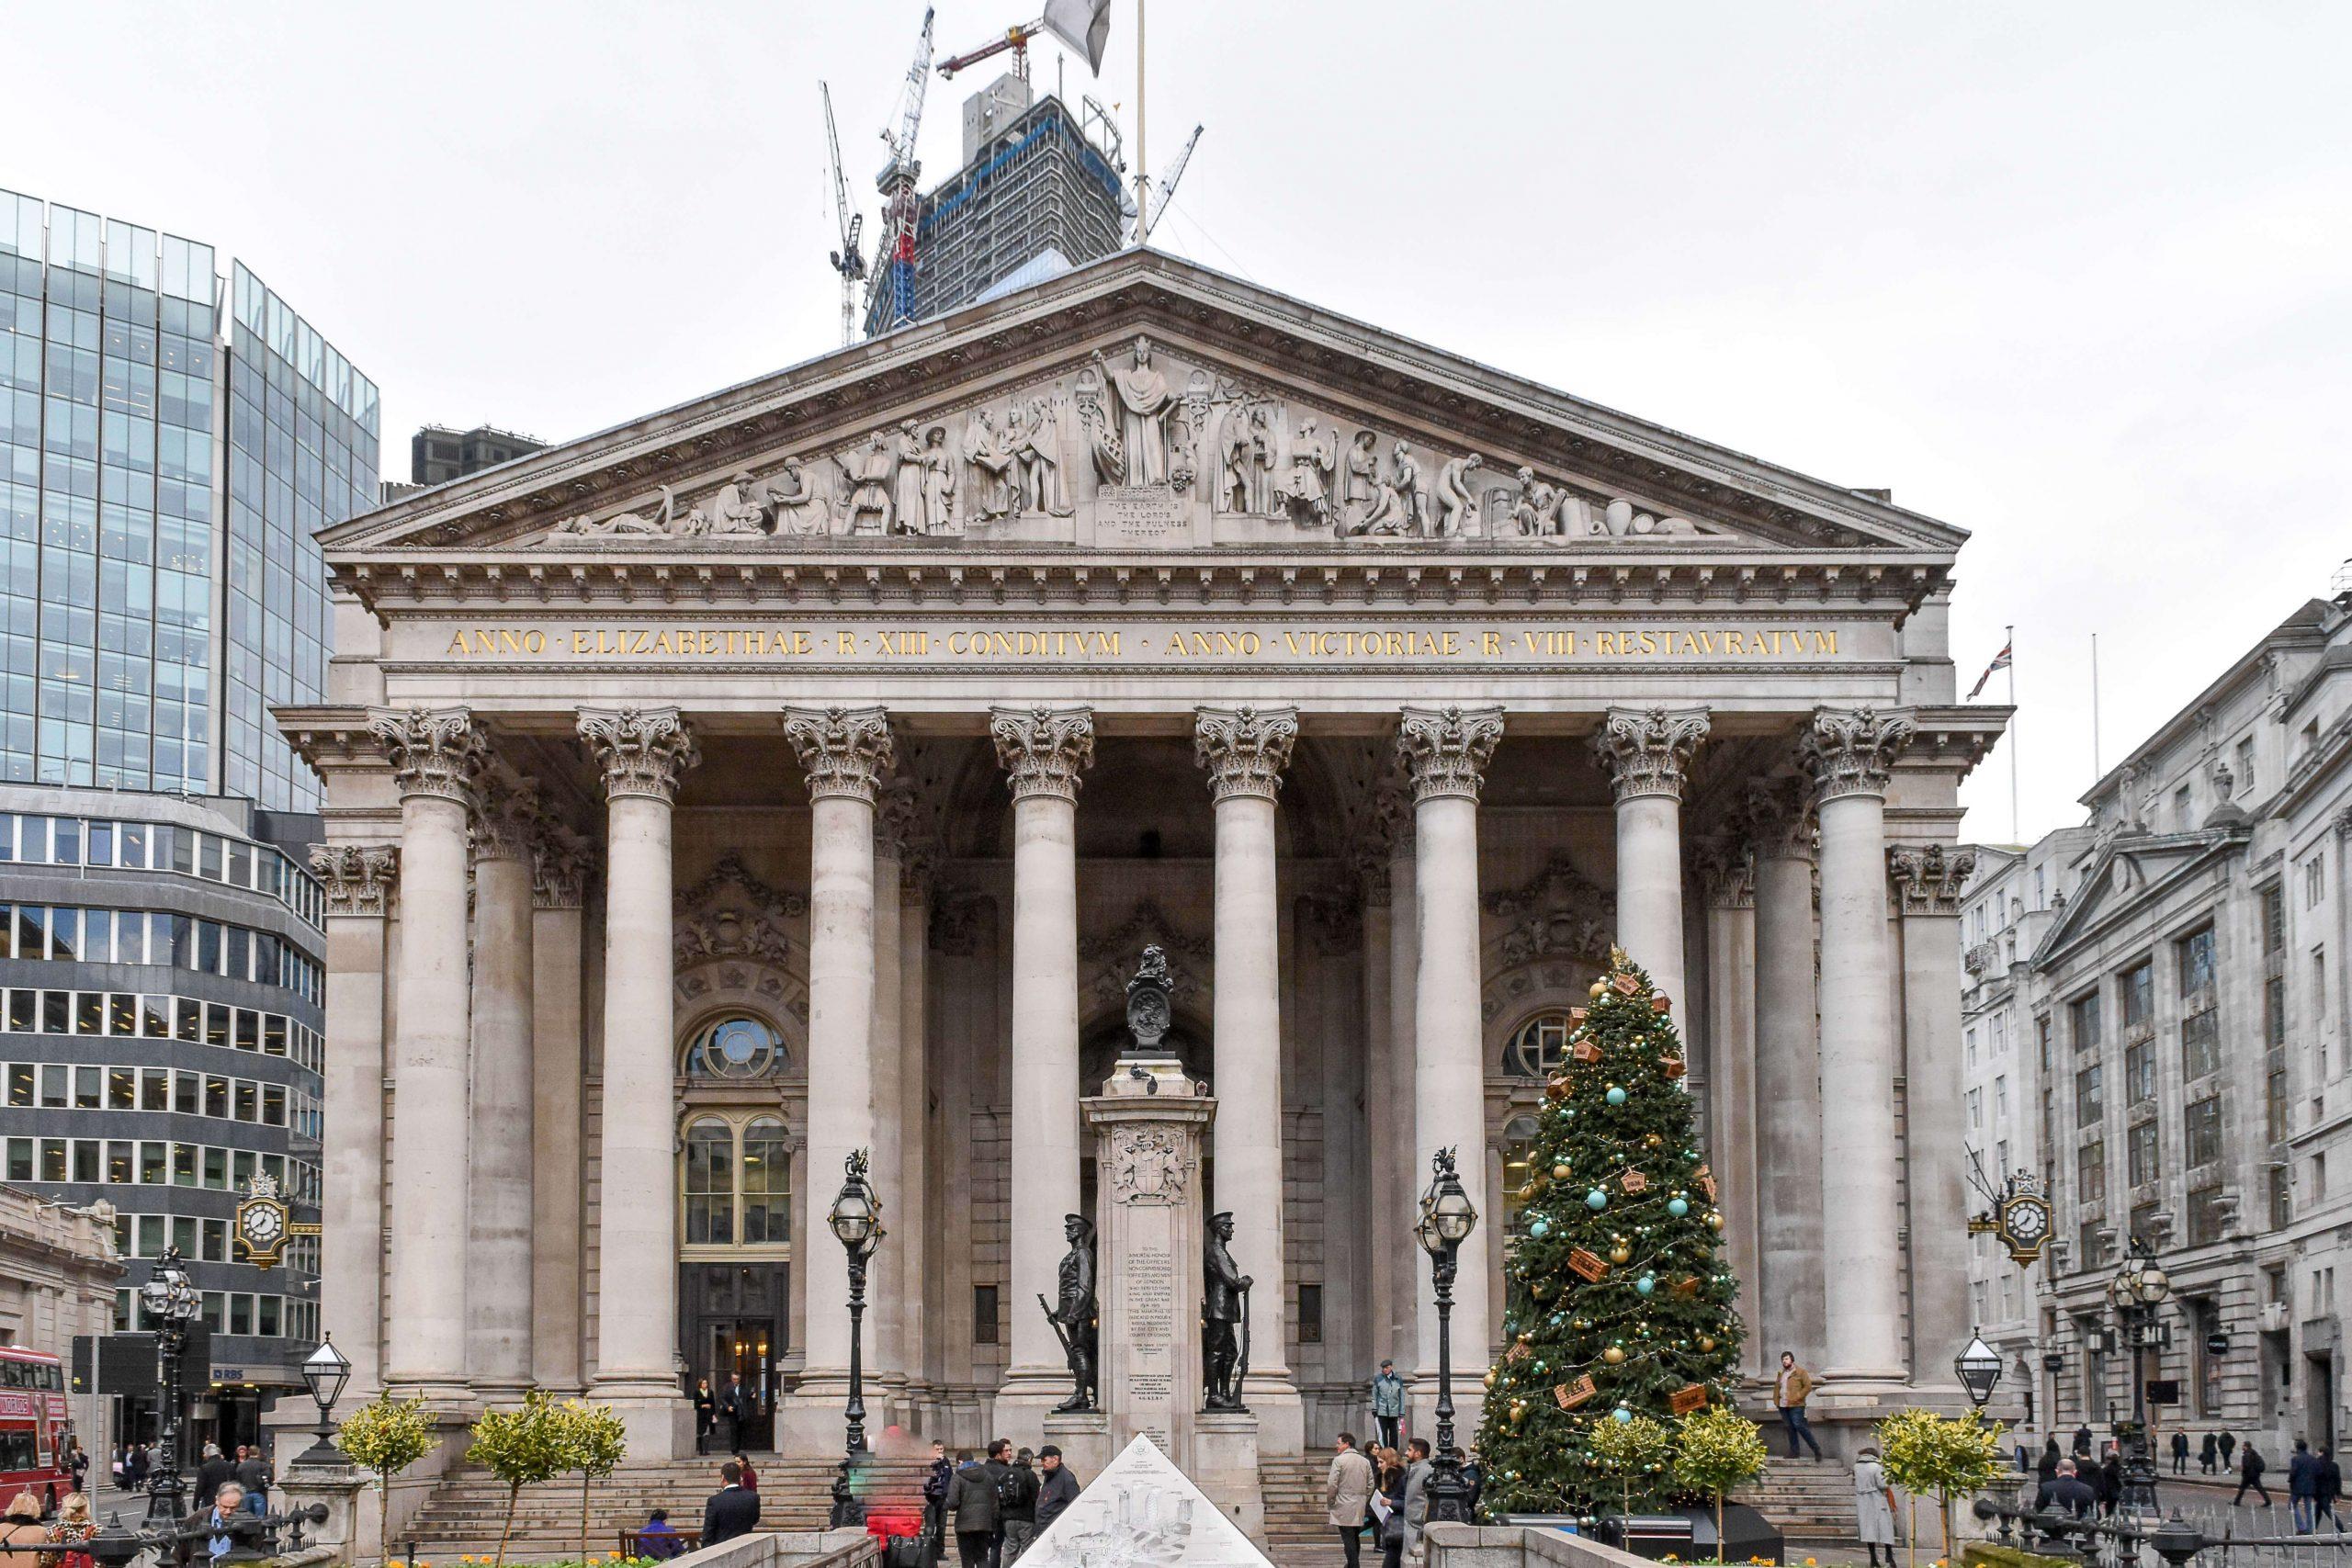 The Royal Exchange, London